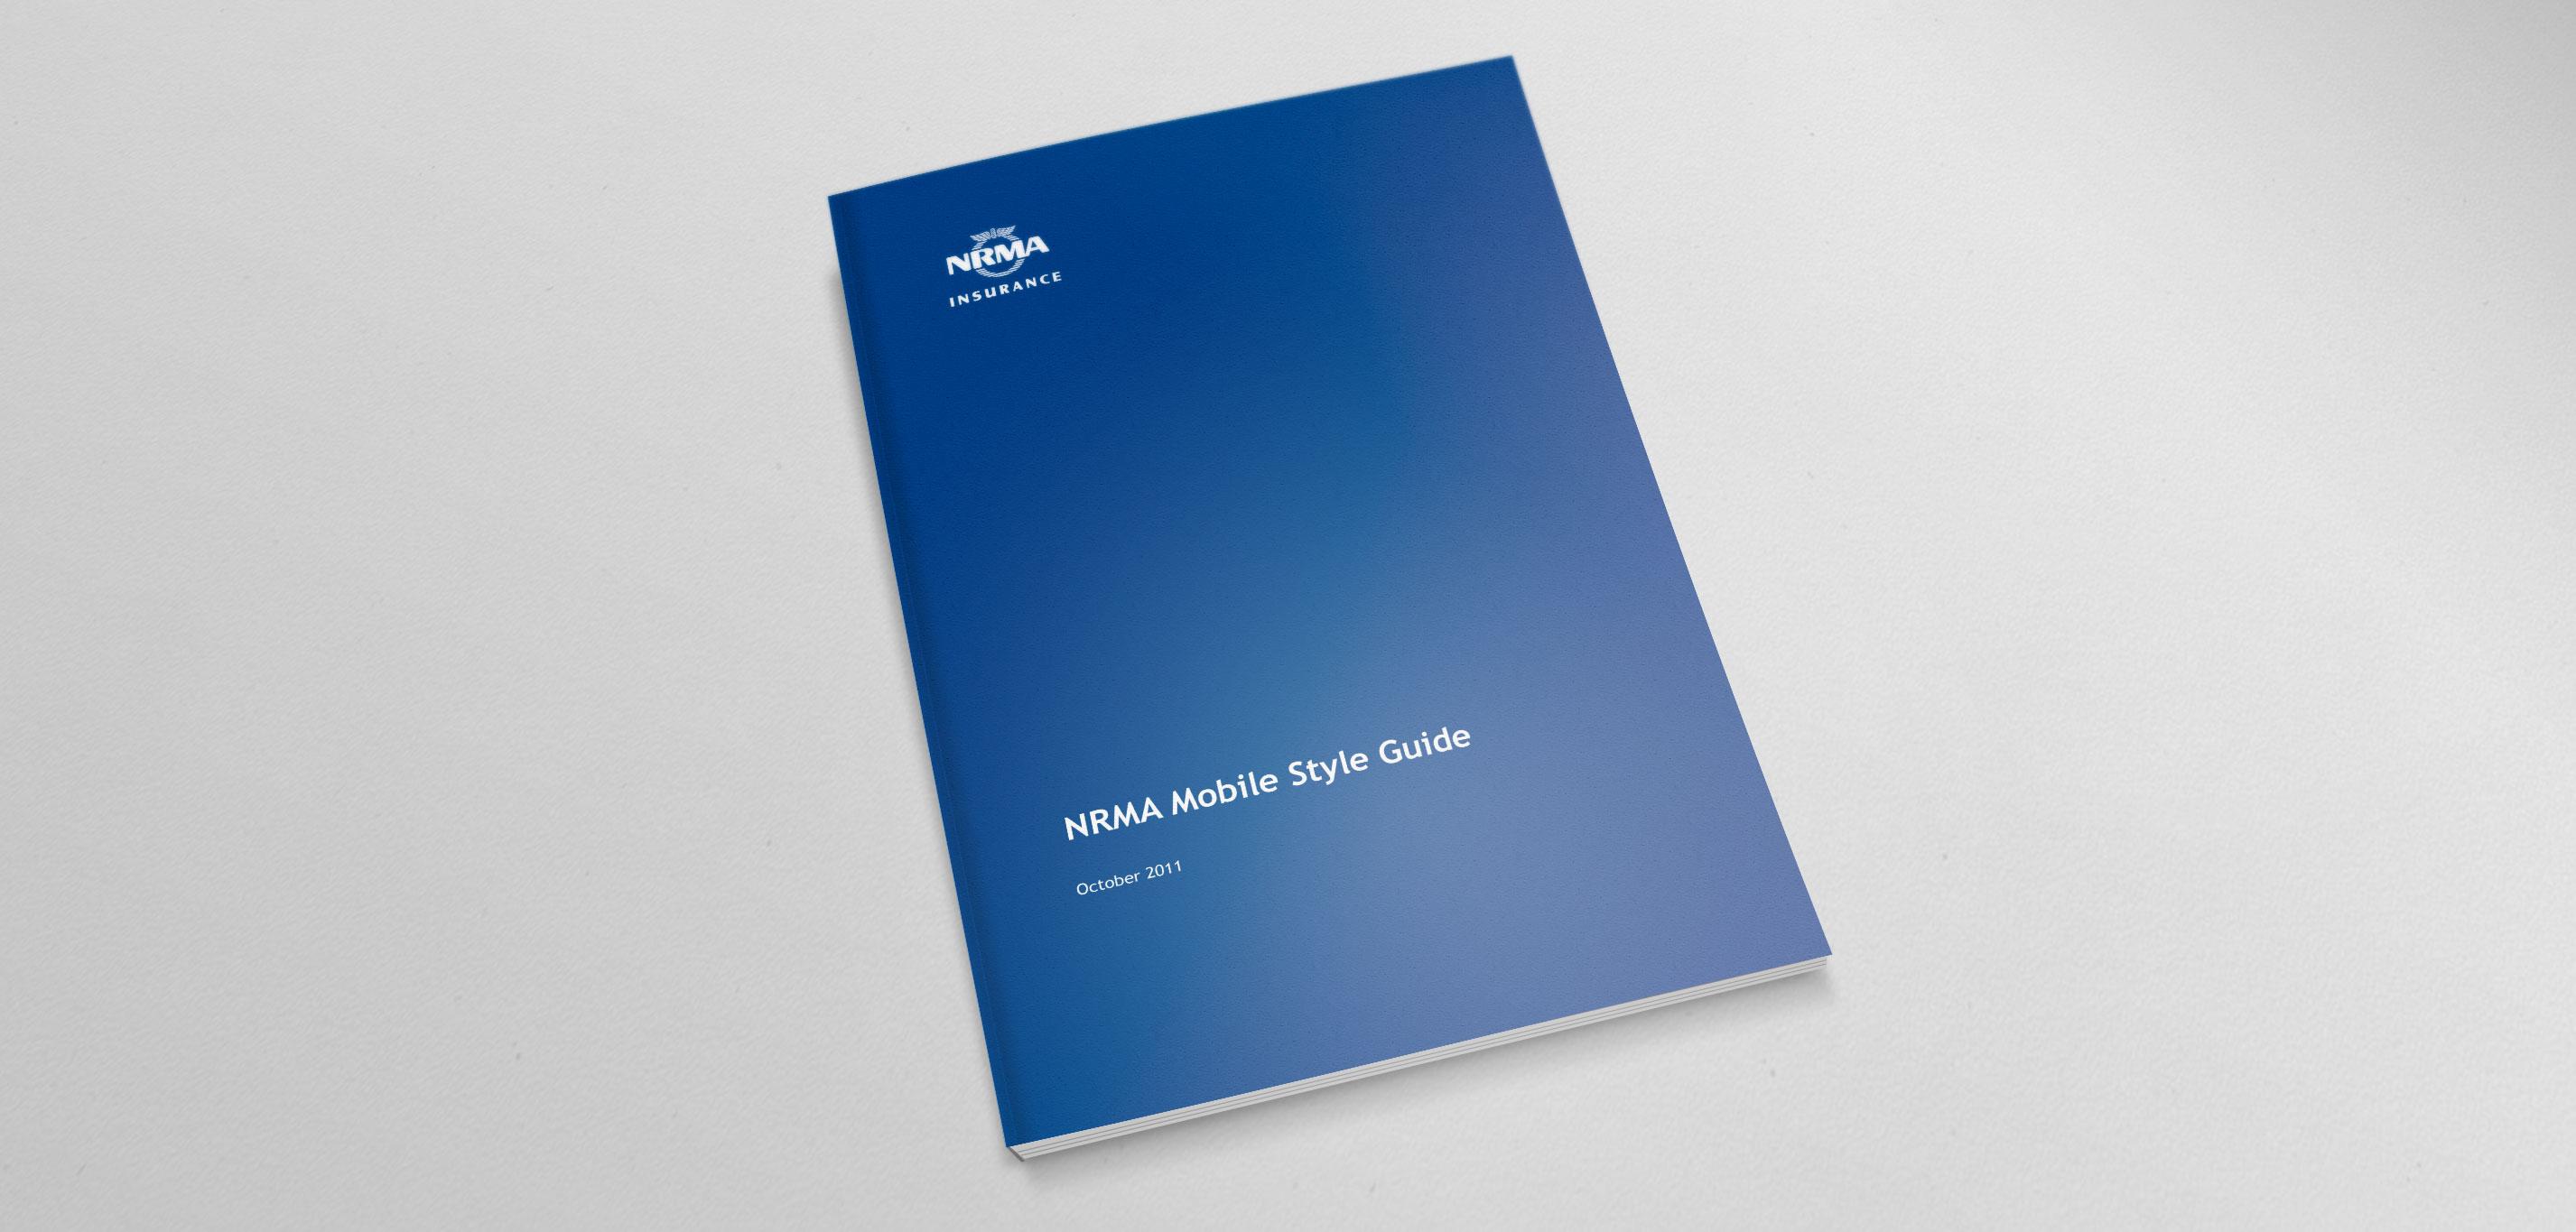 NRMA-Style-Guide-Mockup-4